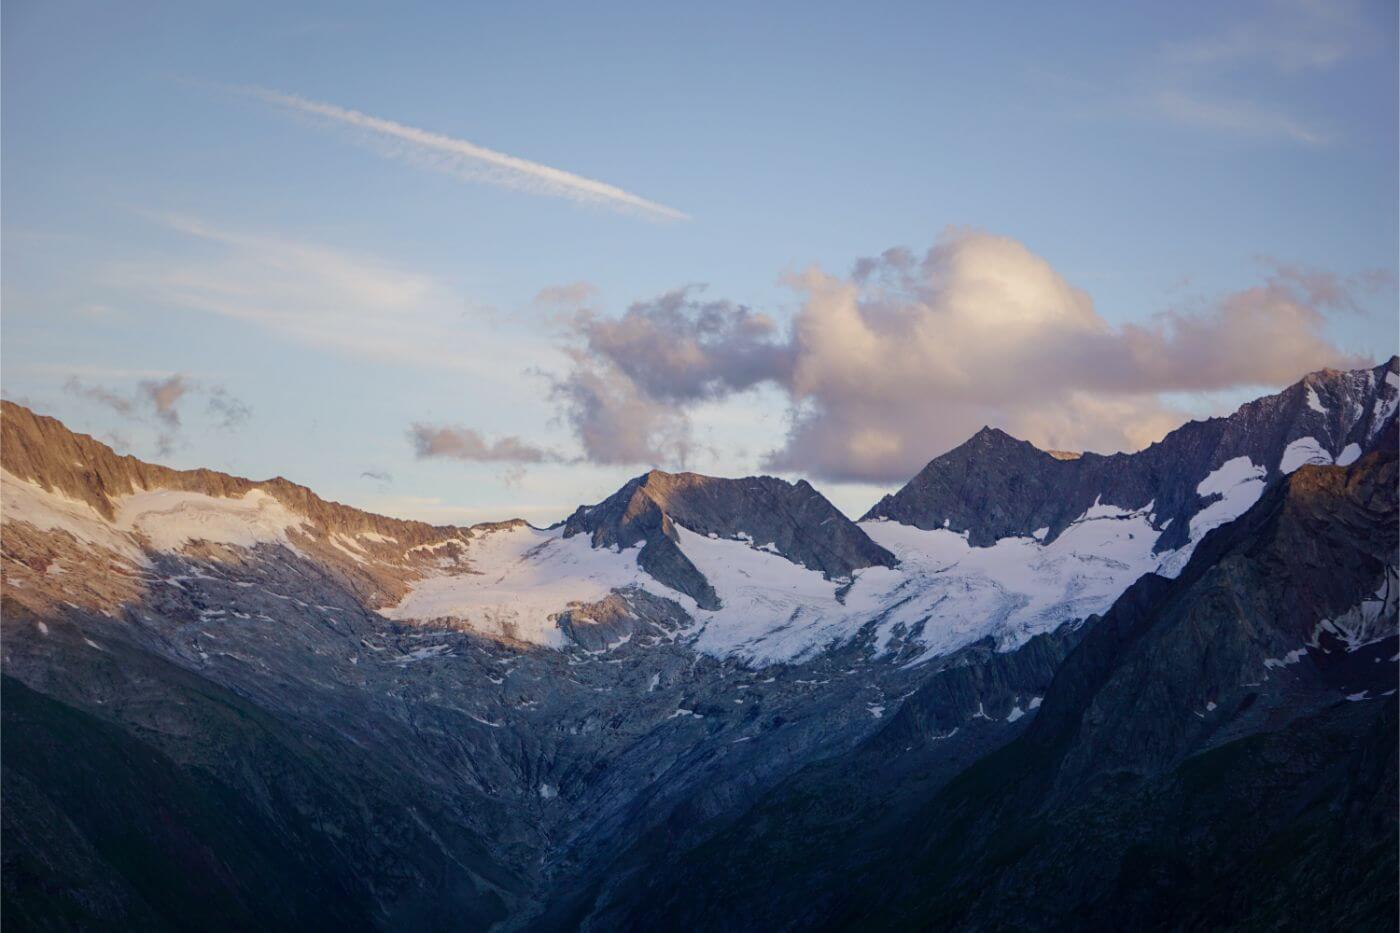 Grosser Möseler and Breitnock peaks, Zillertal Alps - Berlin High Trail trekking guide